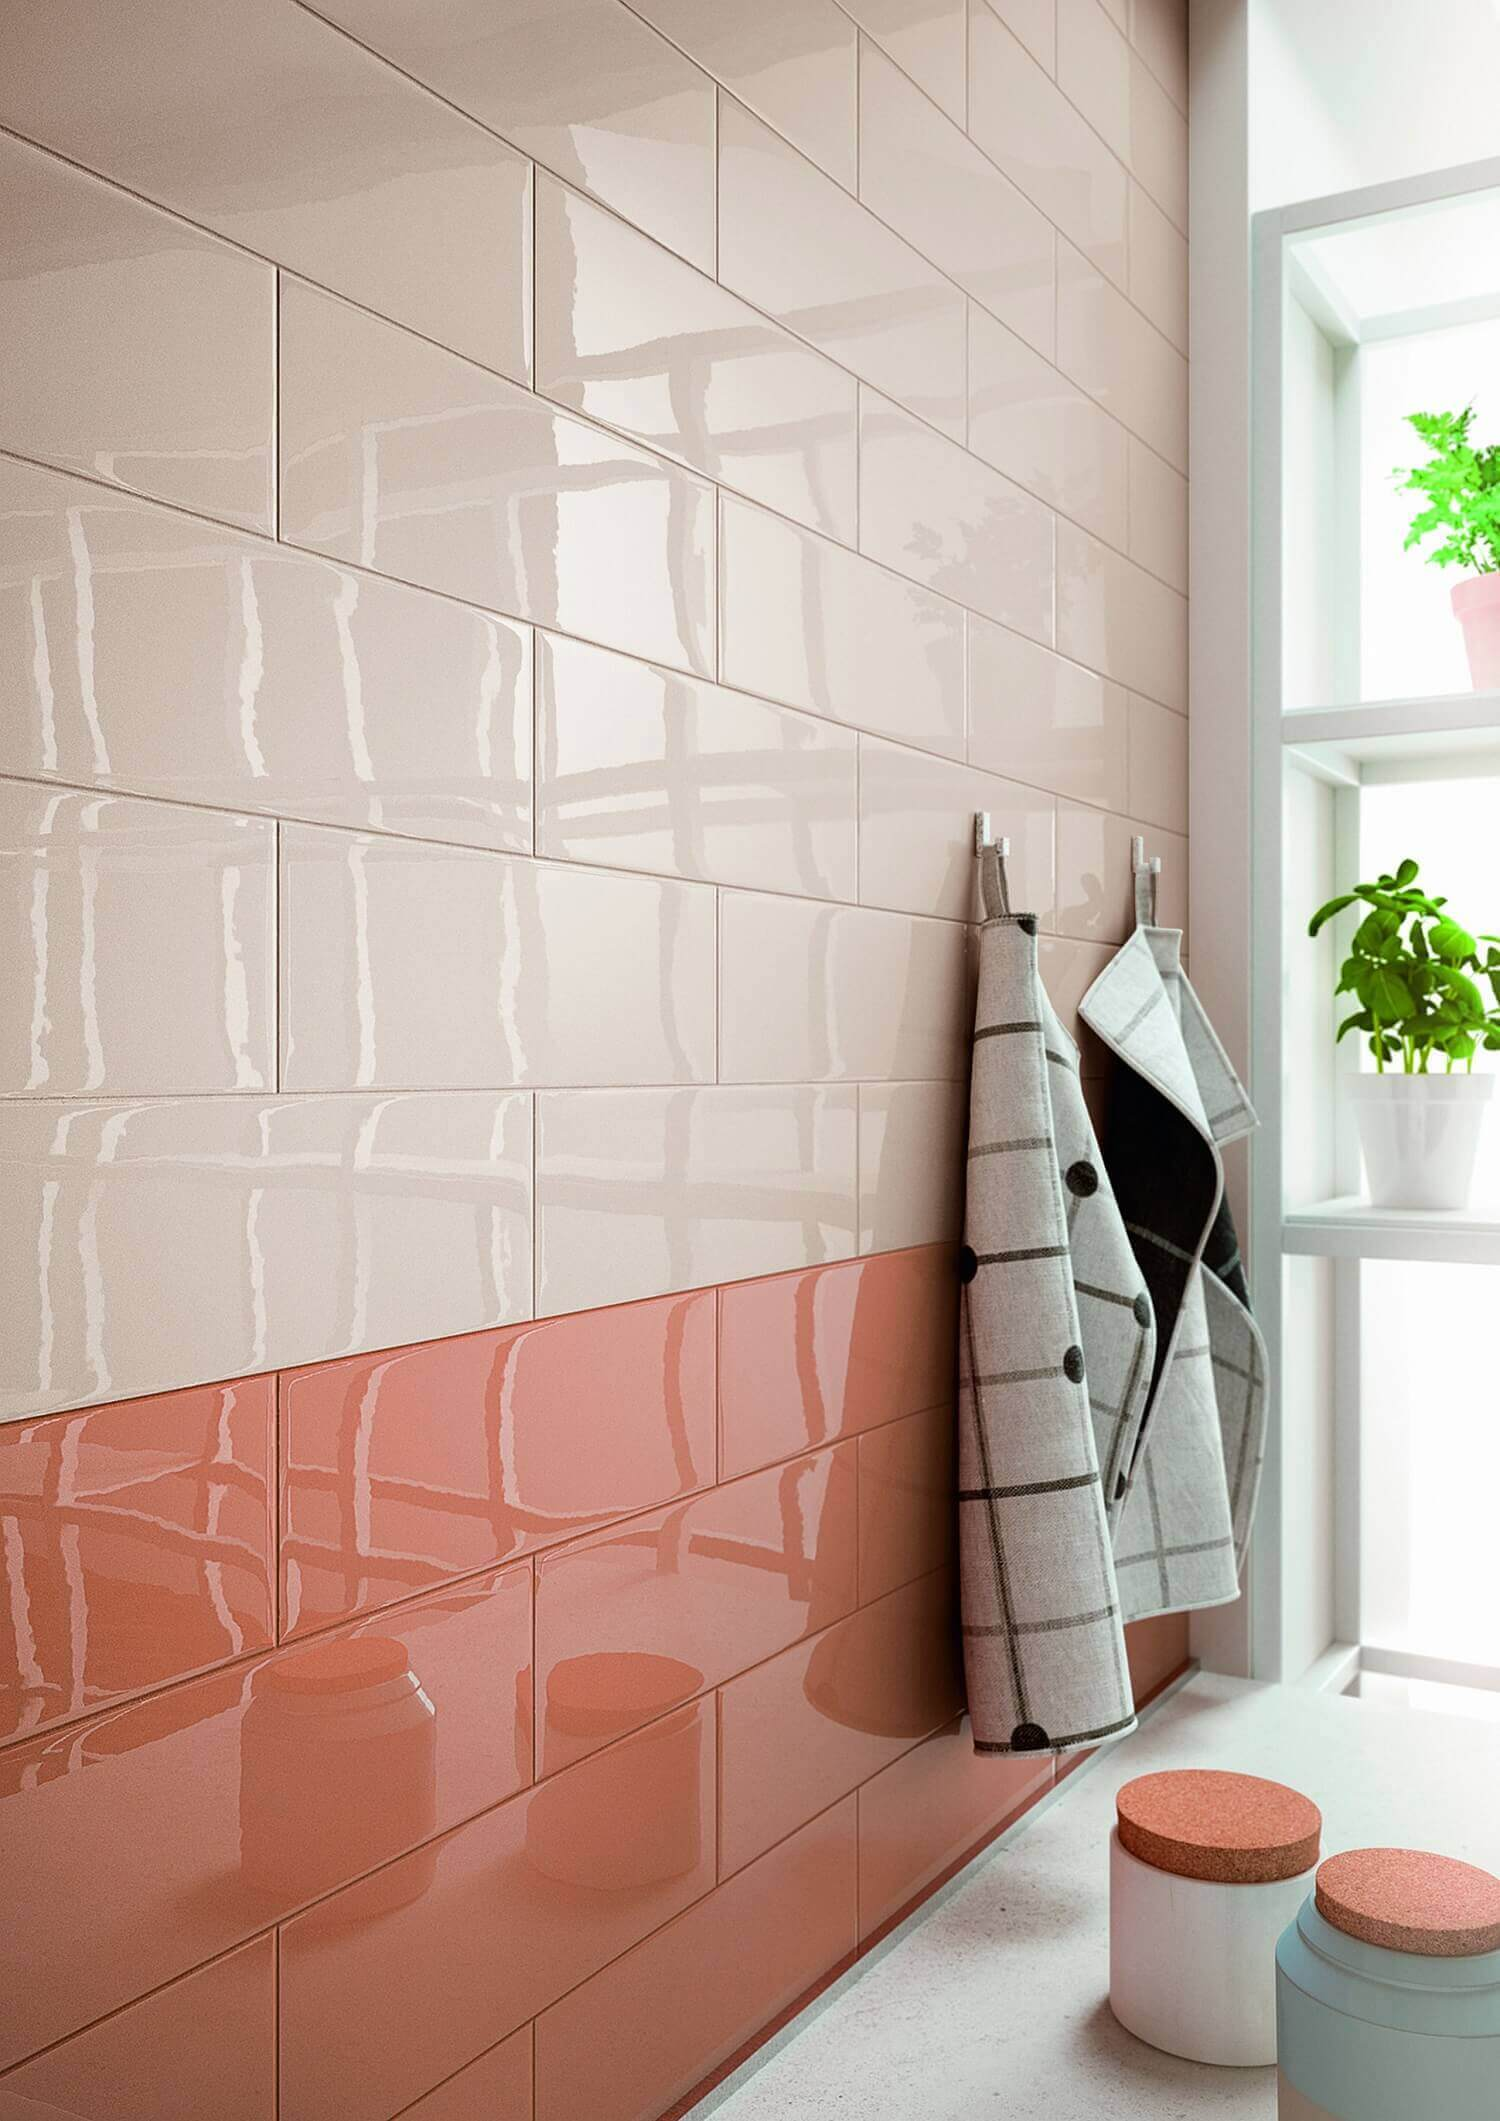 Cover bathroom tile